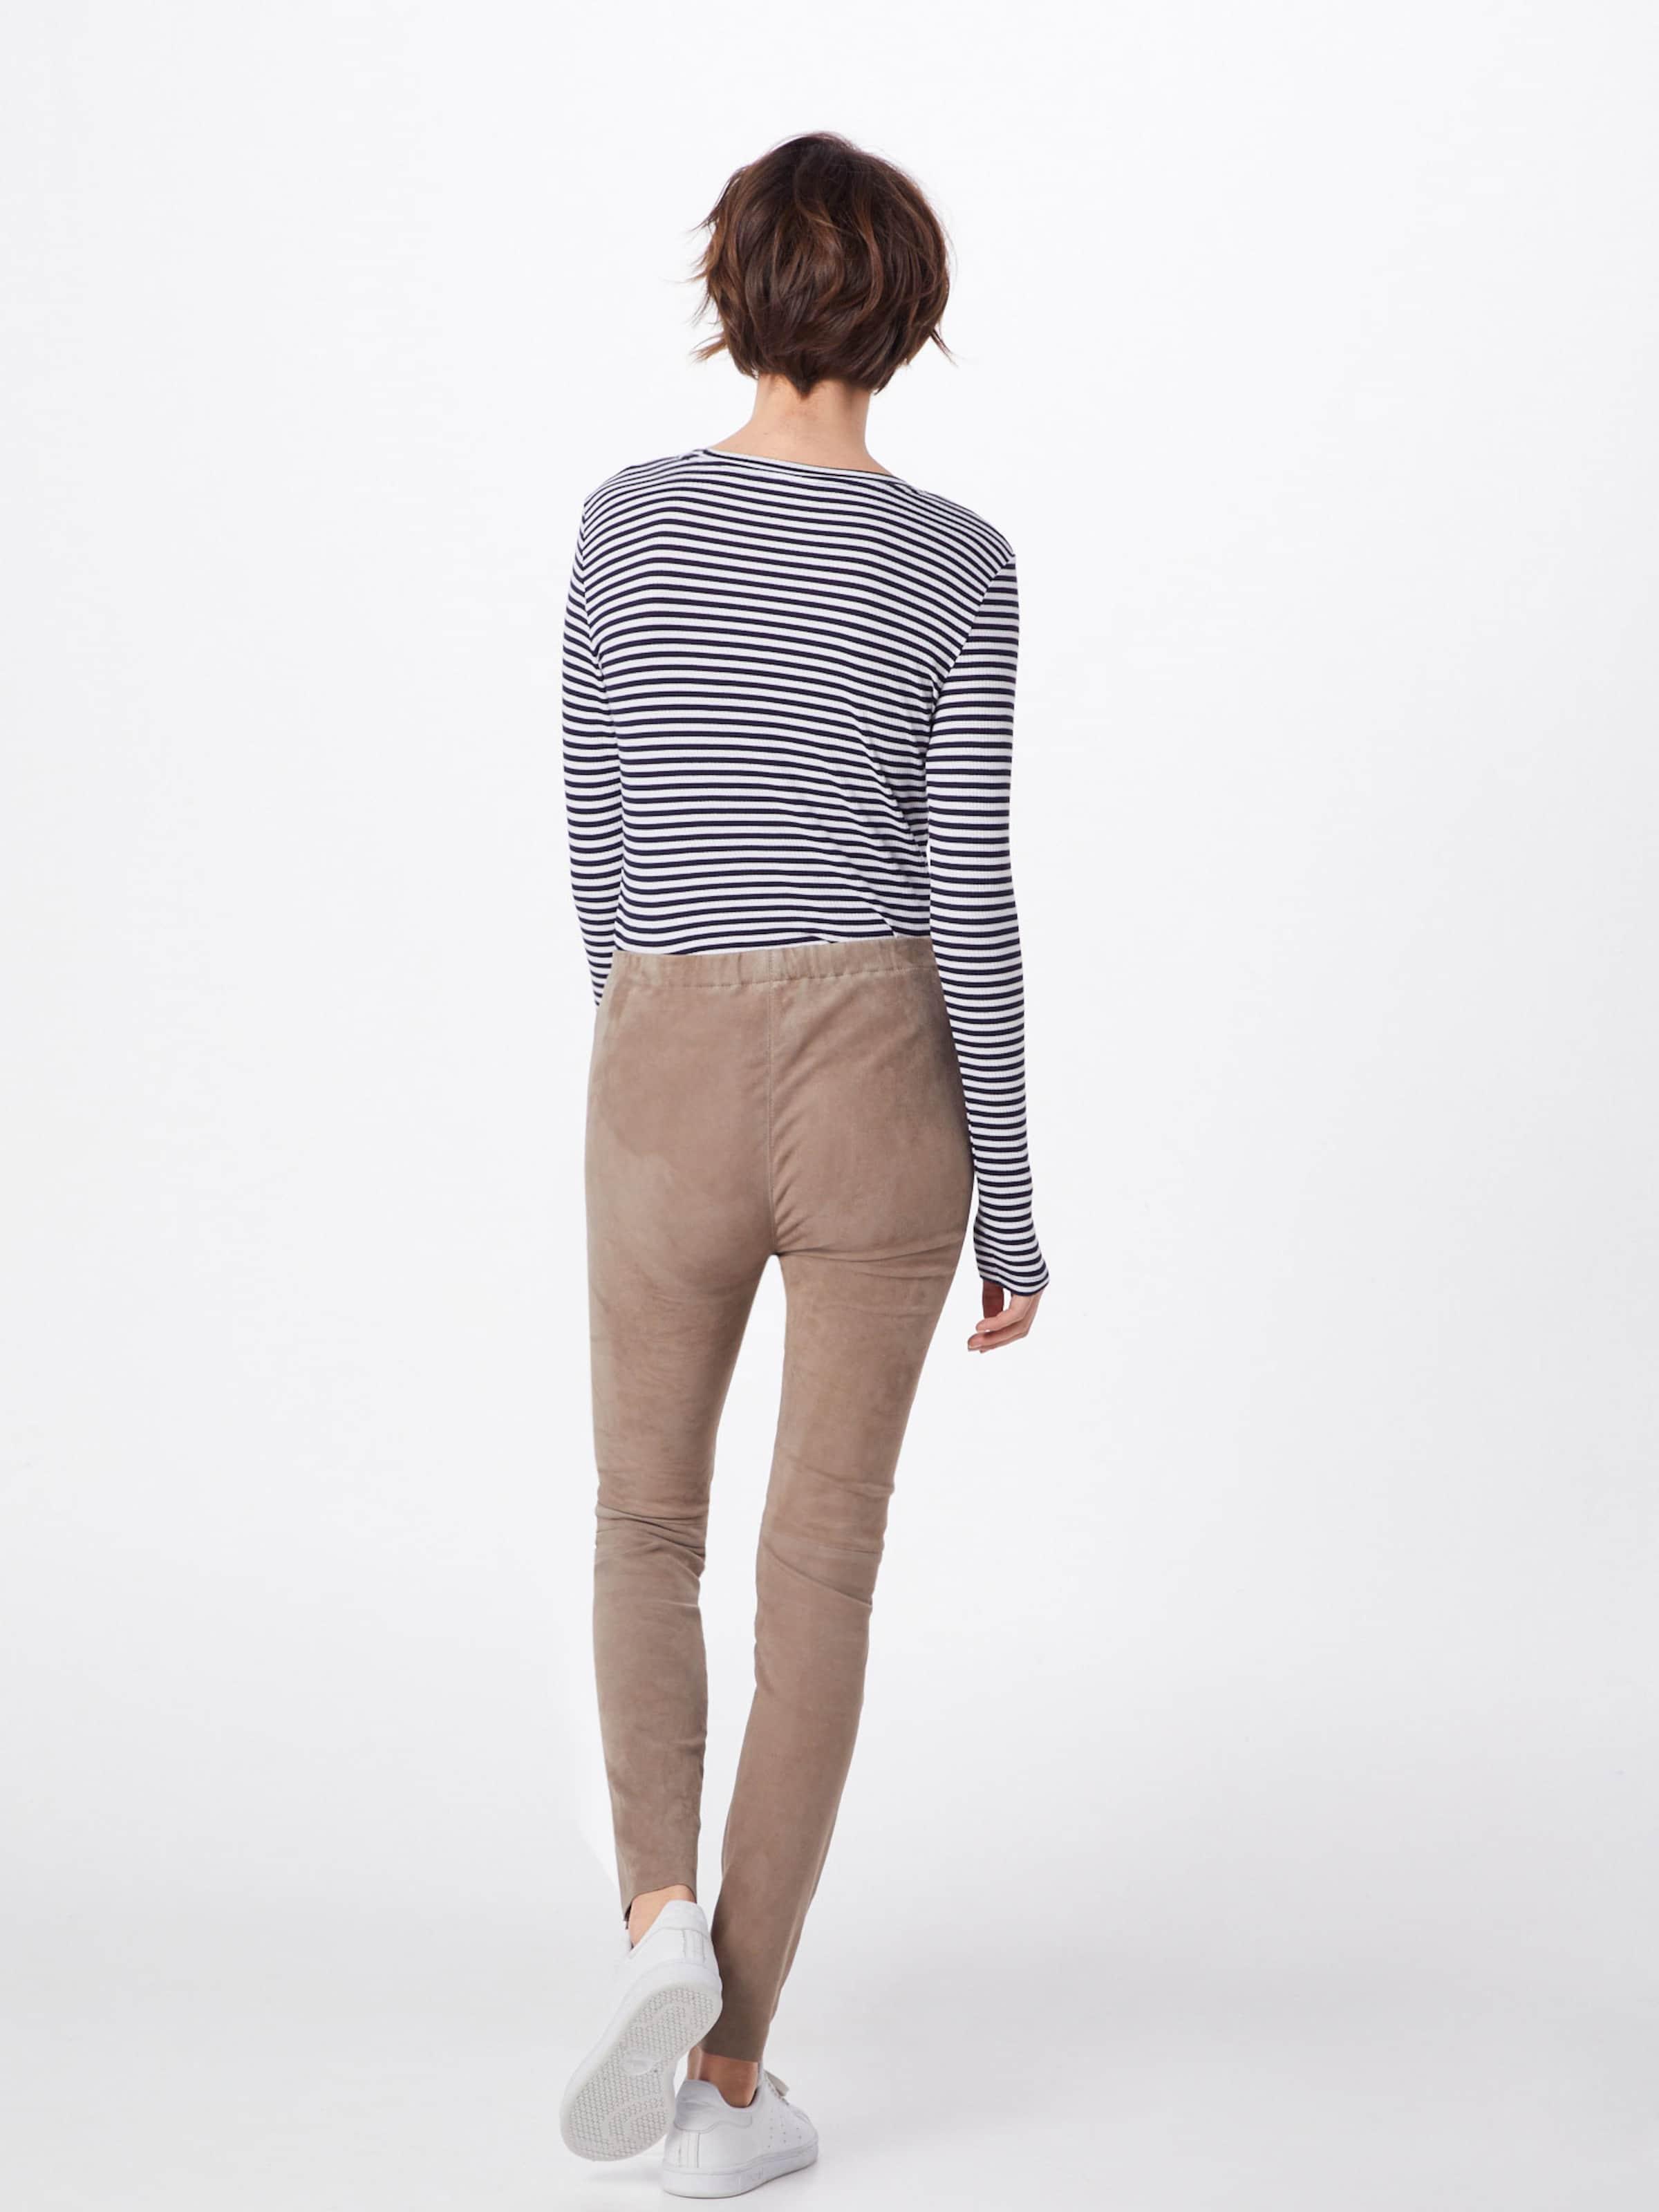 Maze Maze En Pantalon En 'bridgetto' Taupe 'bridgetto' Pantalon Taupe rdBeWQxCo